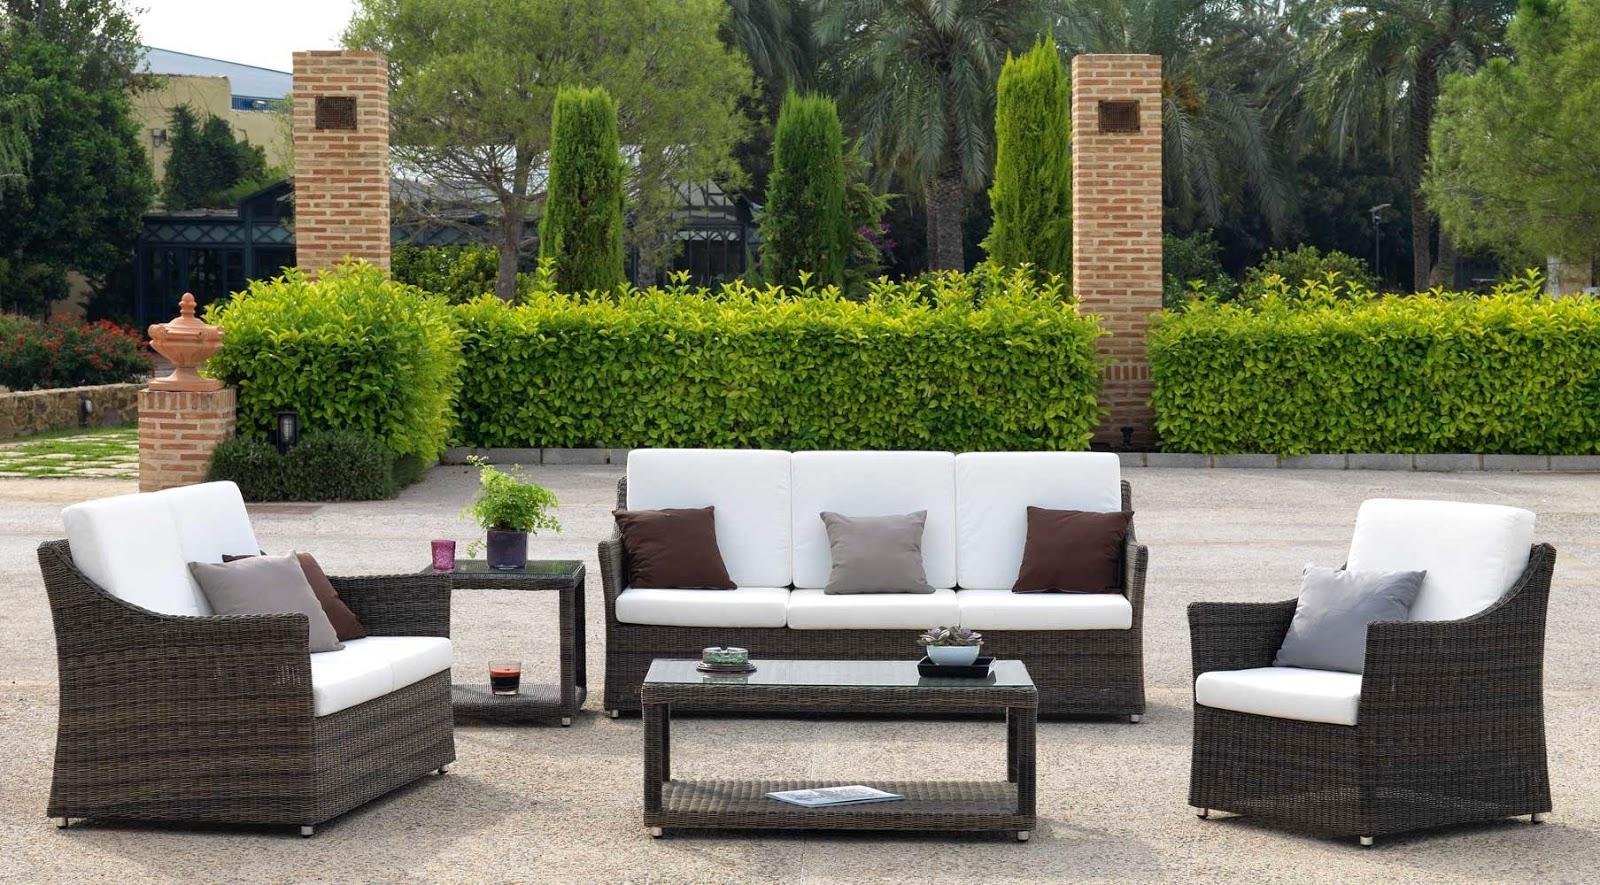 Blog de mbar muebles muebles de exterior for Muebles jardin exterior modernos